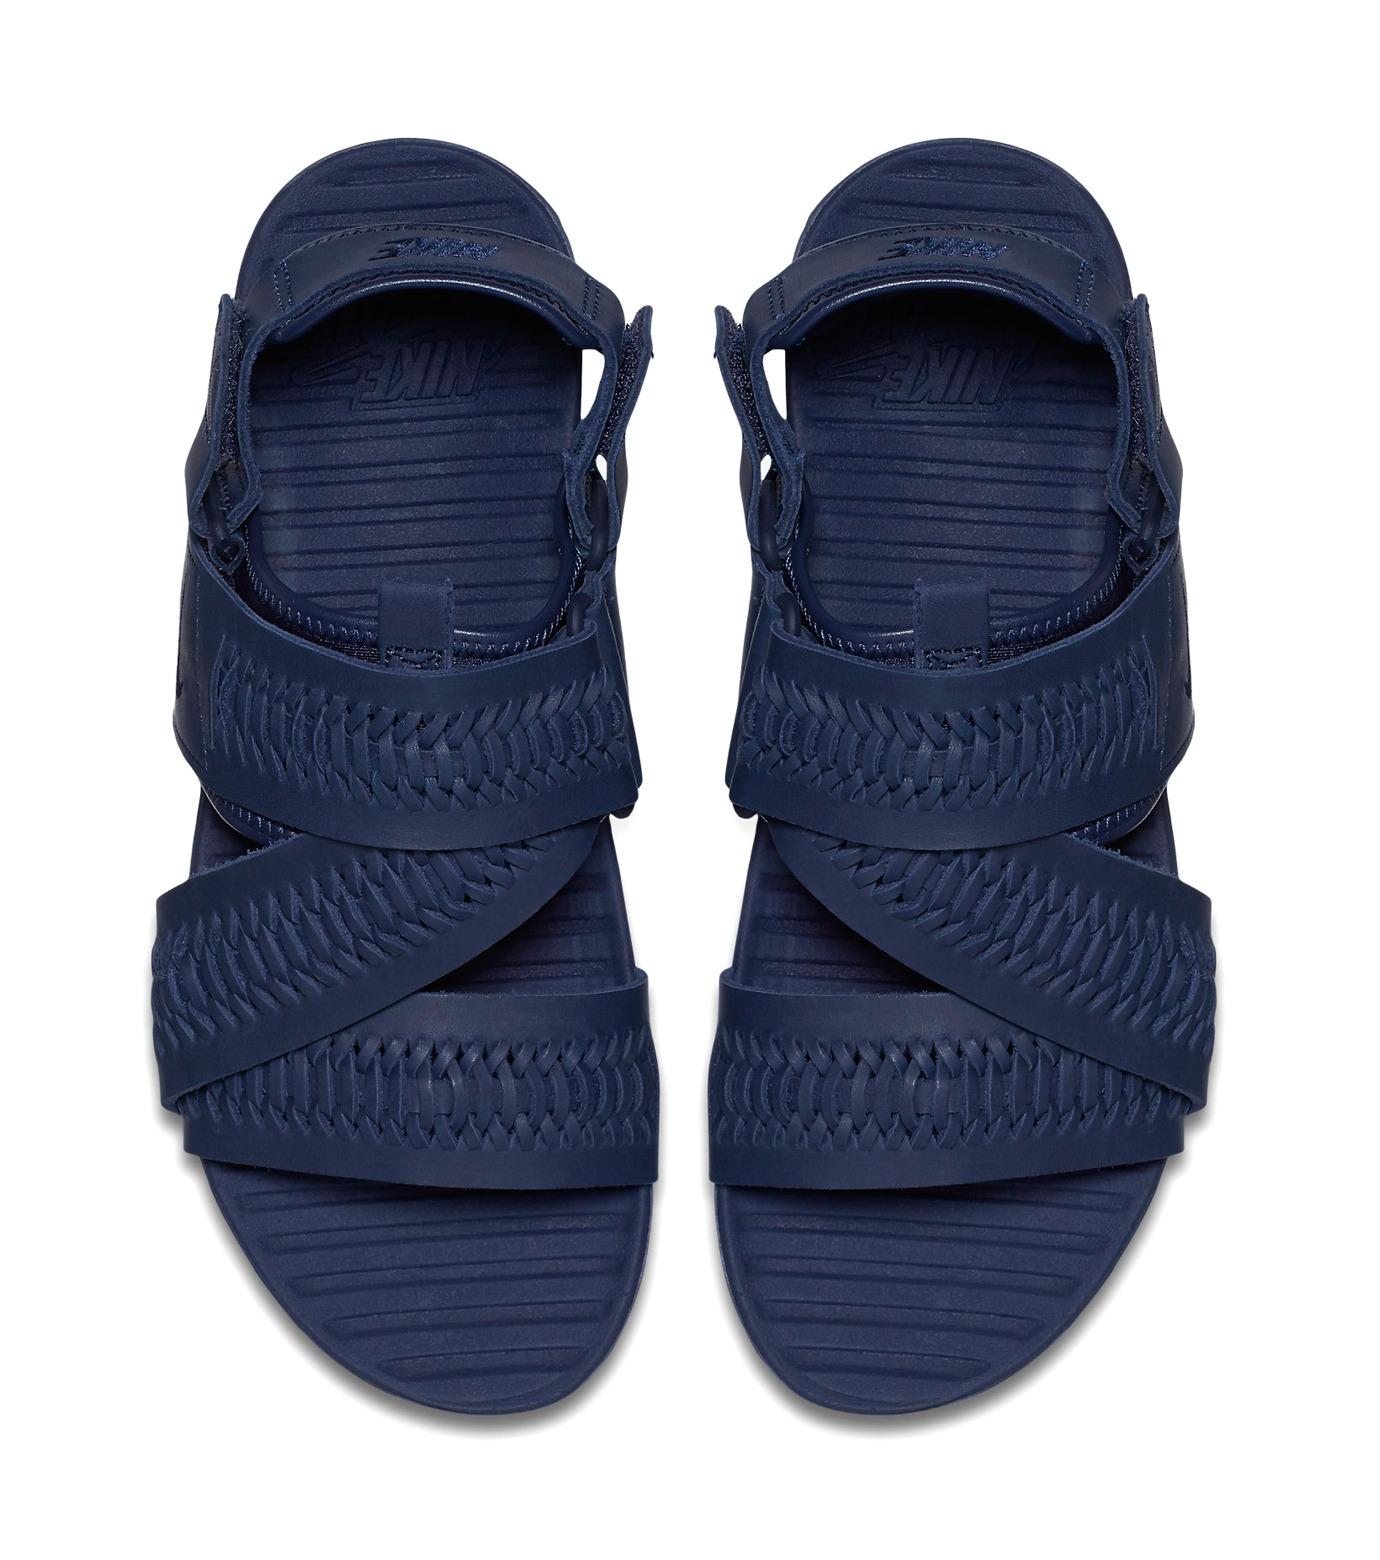 NIKE(ナイキ)のAIR SOLARSOFT ZIGZAG-BLUE(シューズ/shoes)-850588-400-92 拡大詳細画像3